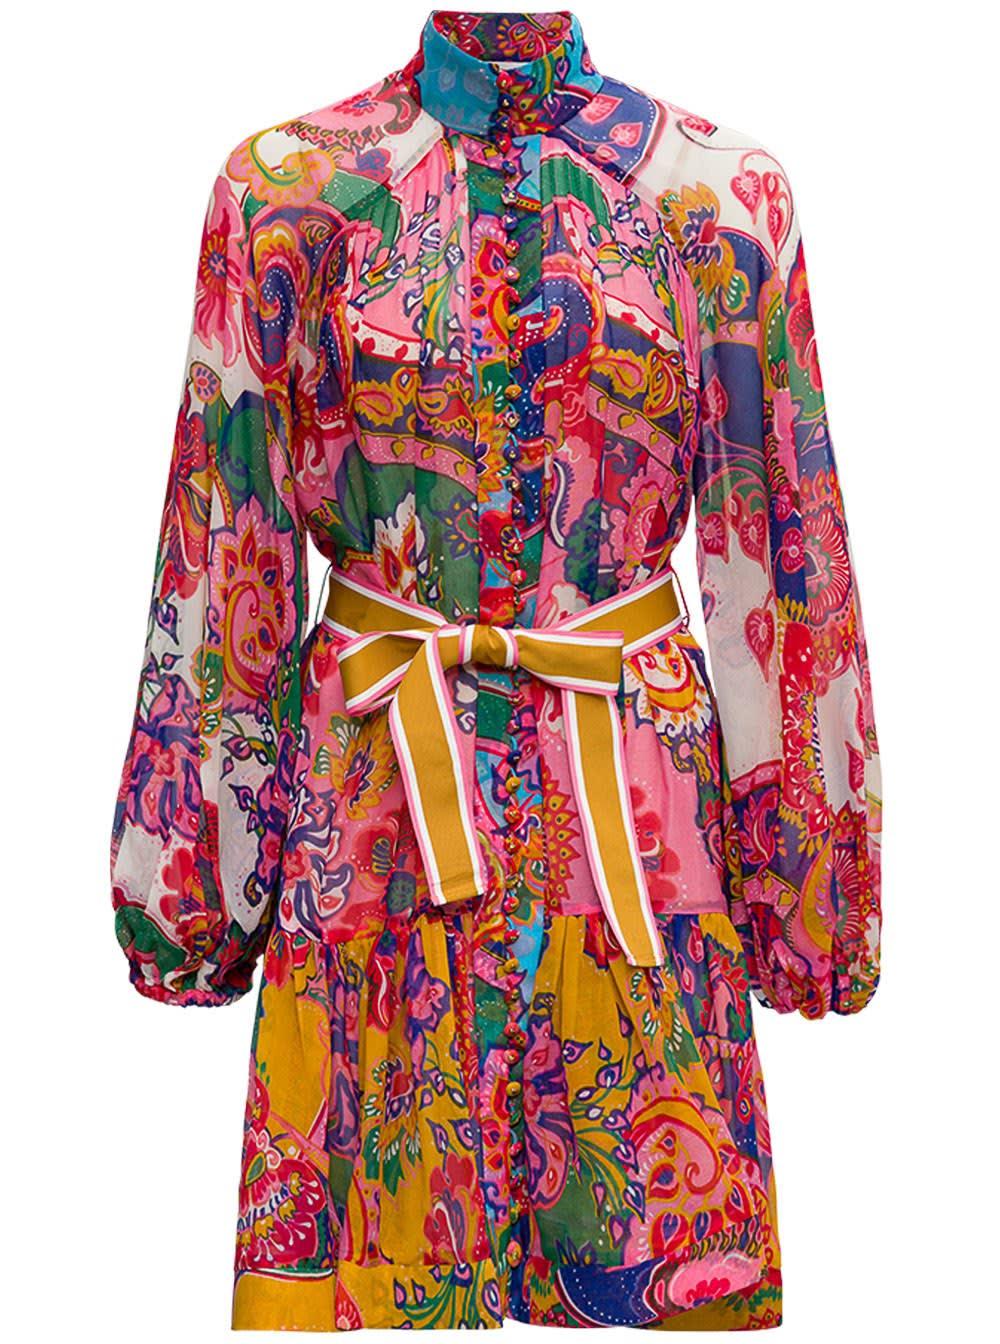 Zimmermann The Lovestruck Floral Dress